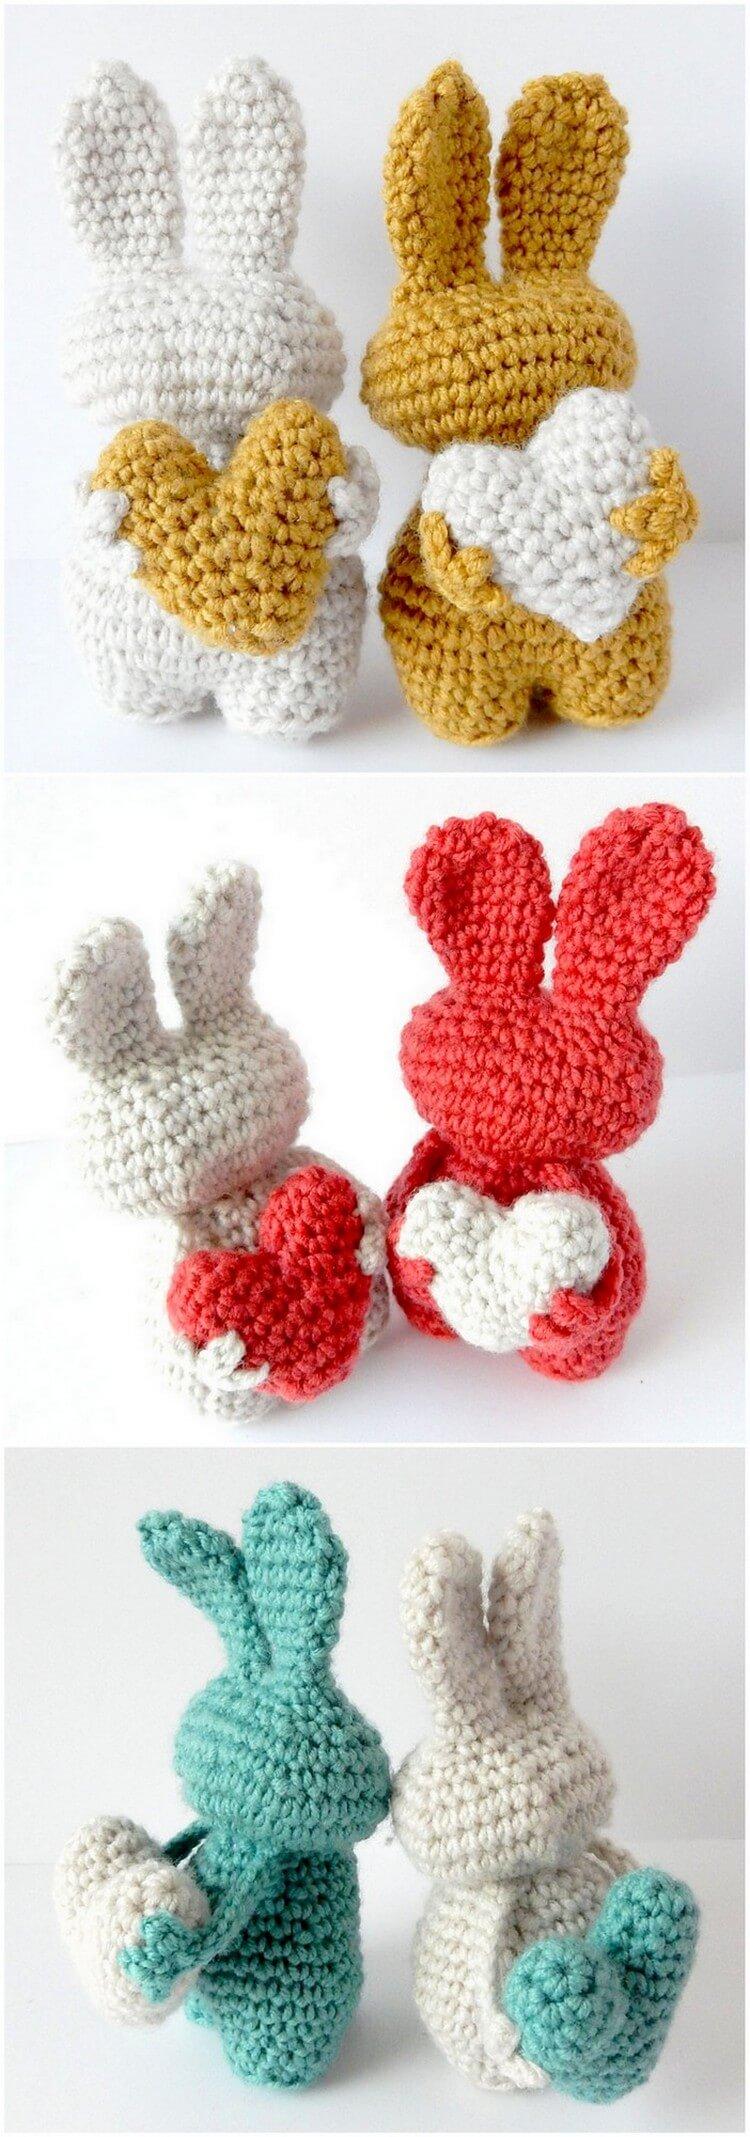 Crochet Amigurumi Pattern (100)